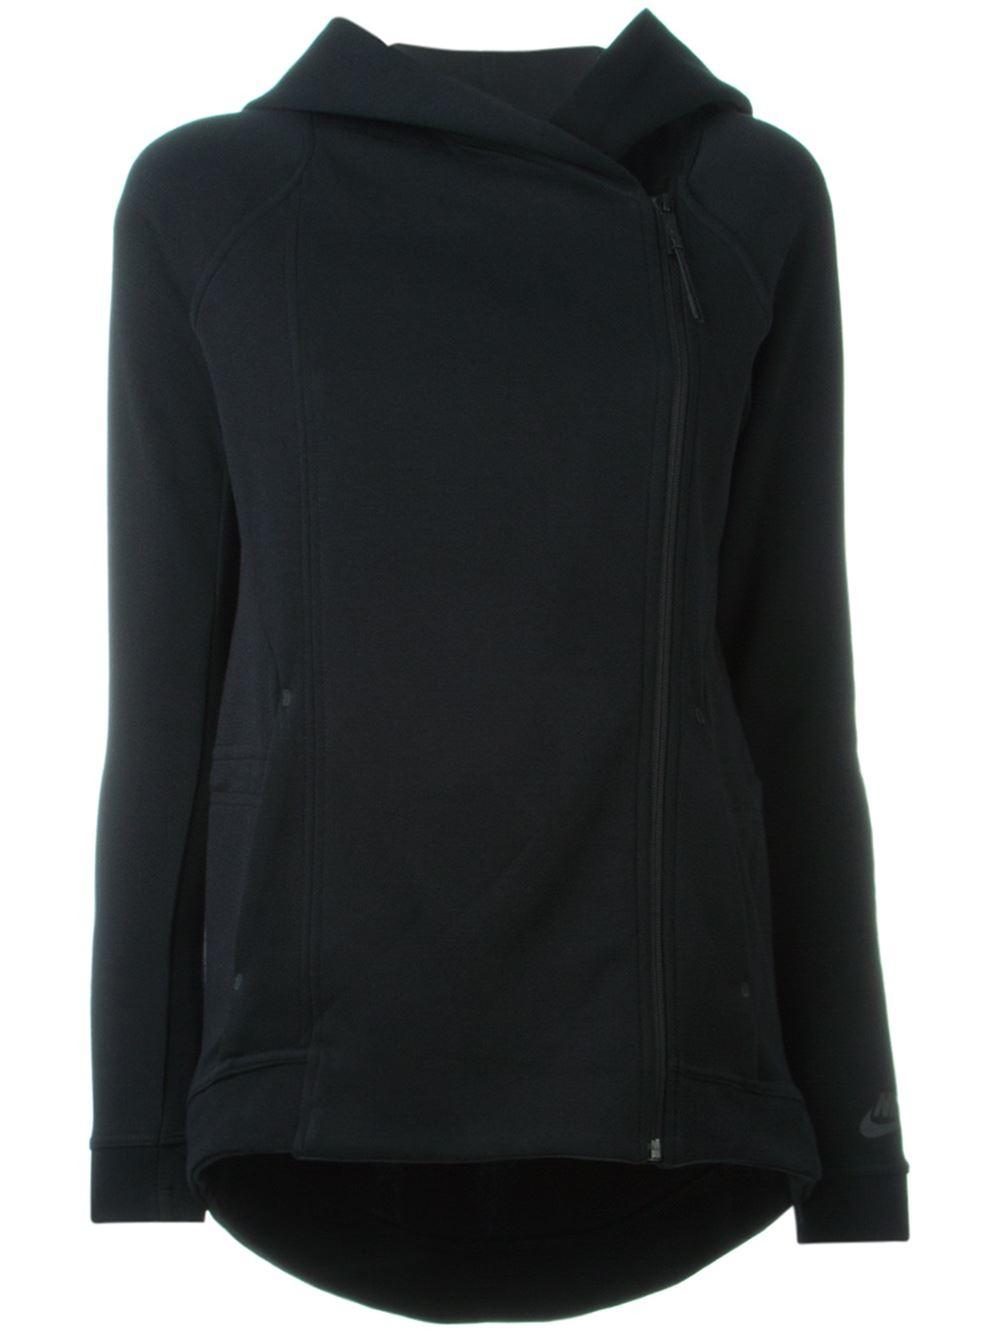 nike 39 tech fleece cape 39 jacket in black lyst. Black Bedroom Furniture Sets. Home Design Ideas